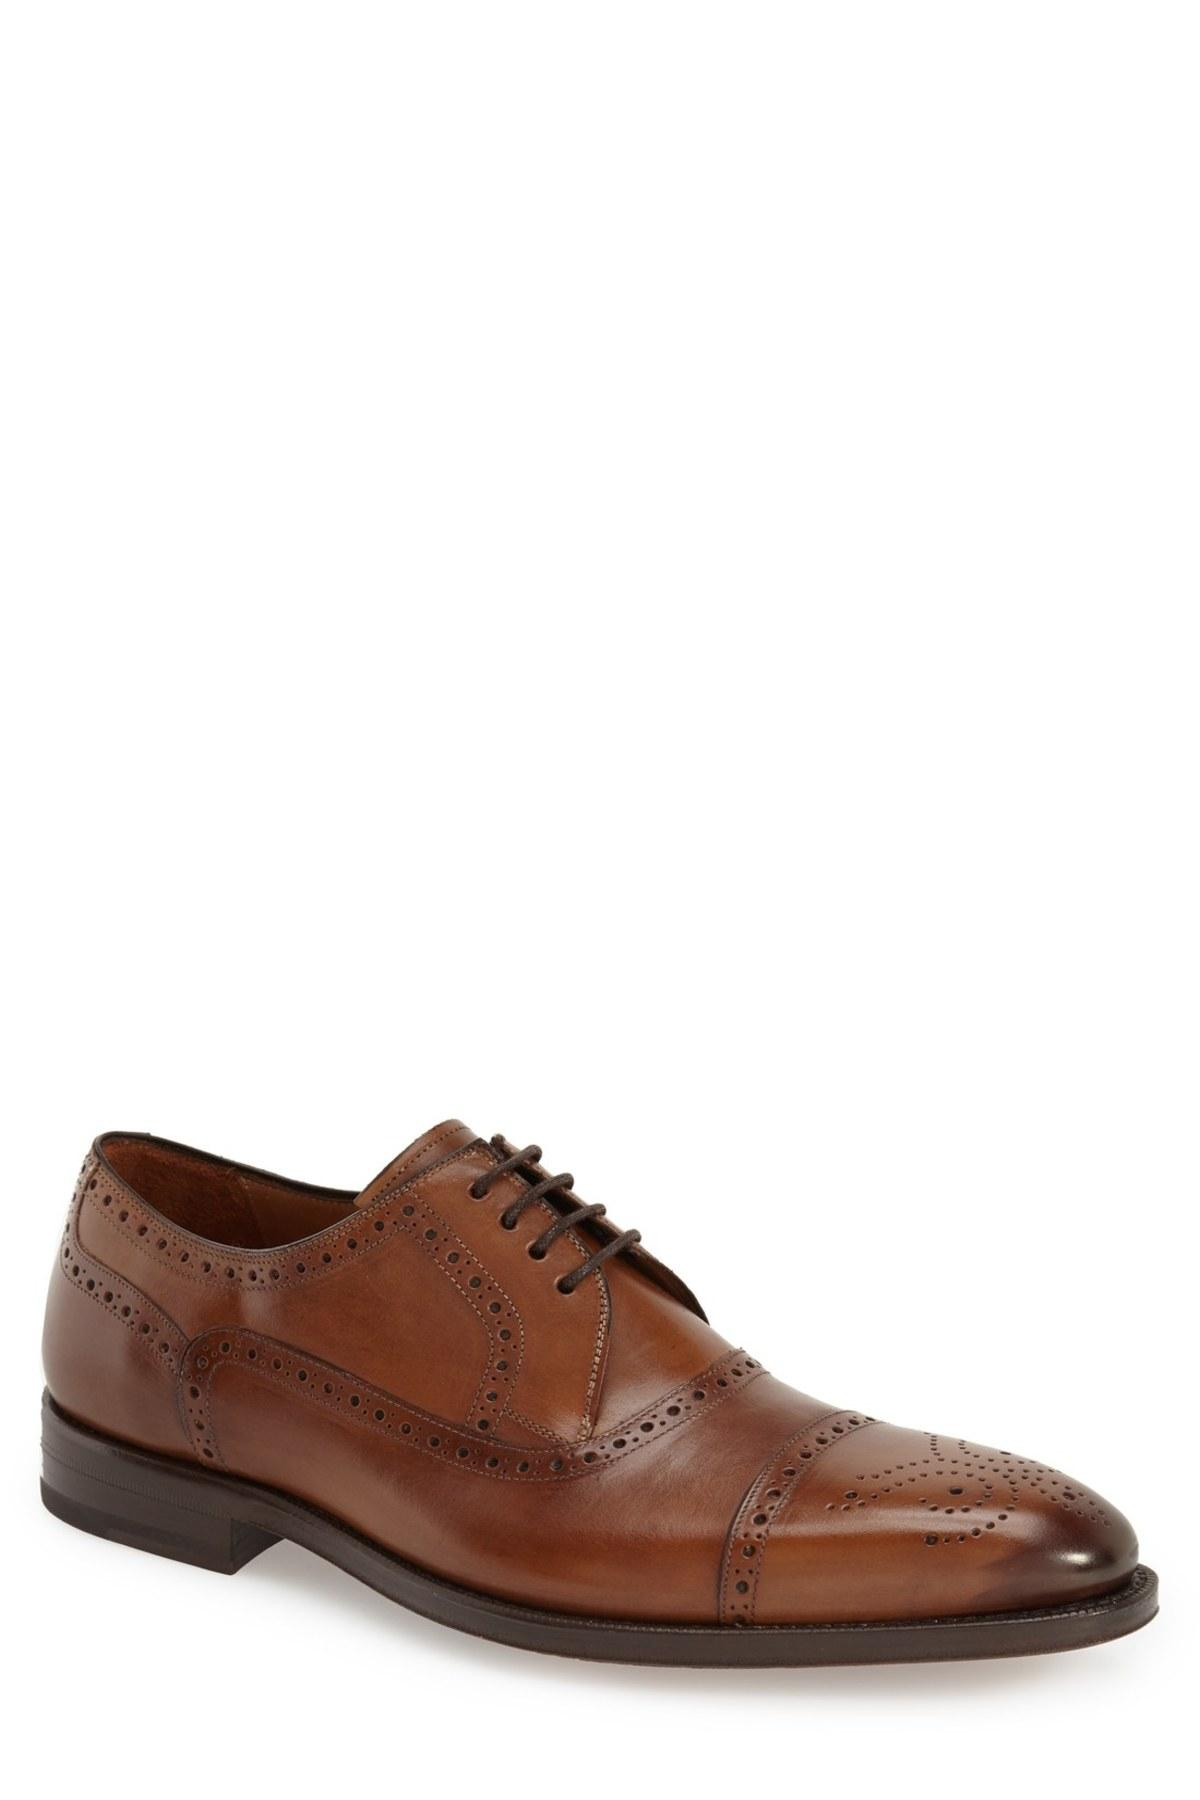 Mezlan Shoes France